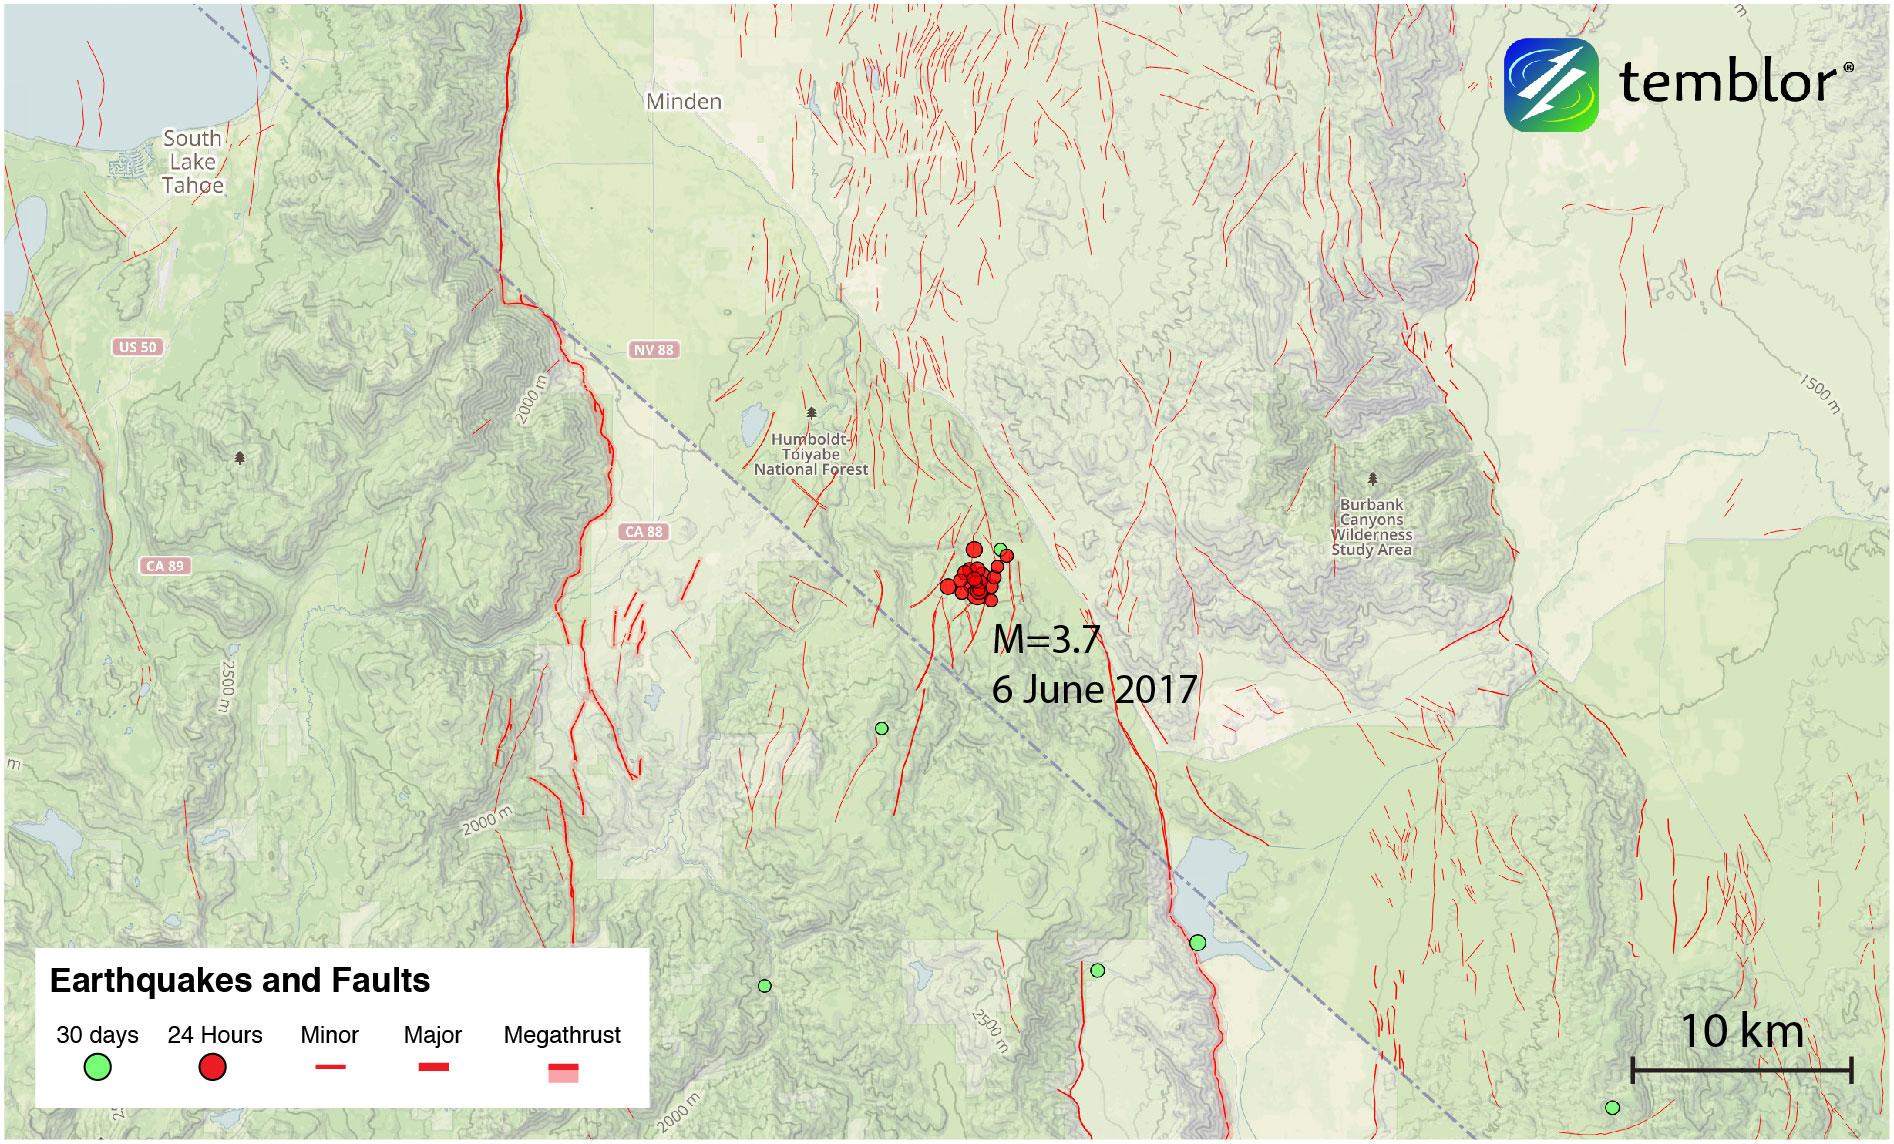 south-lake-tahoe-earthquake